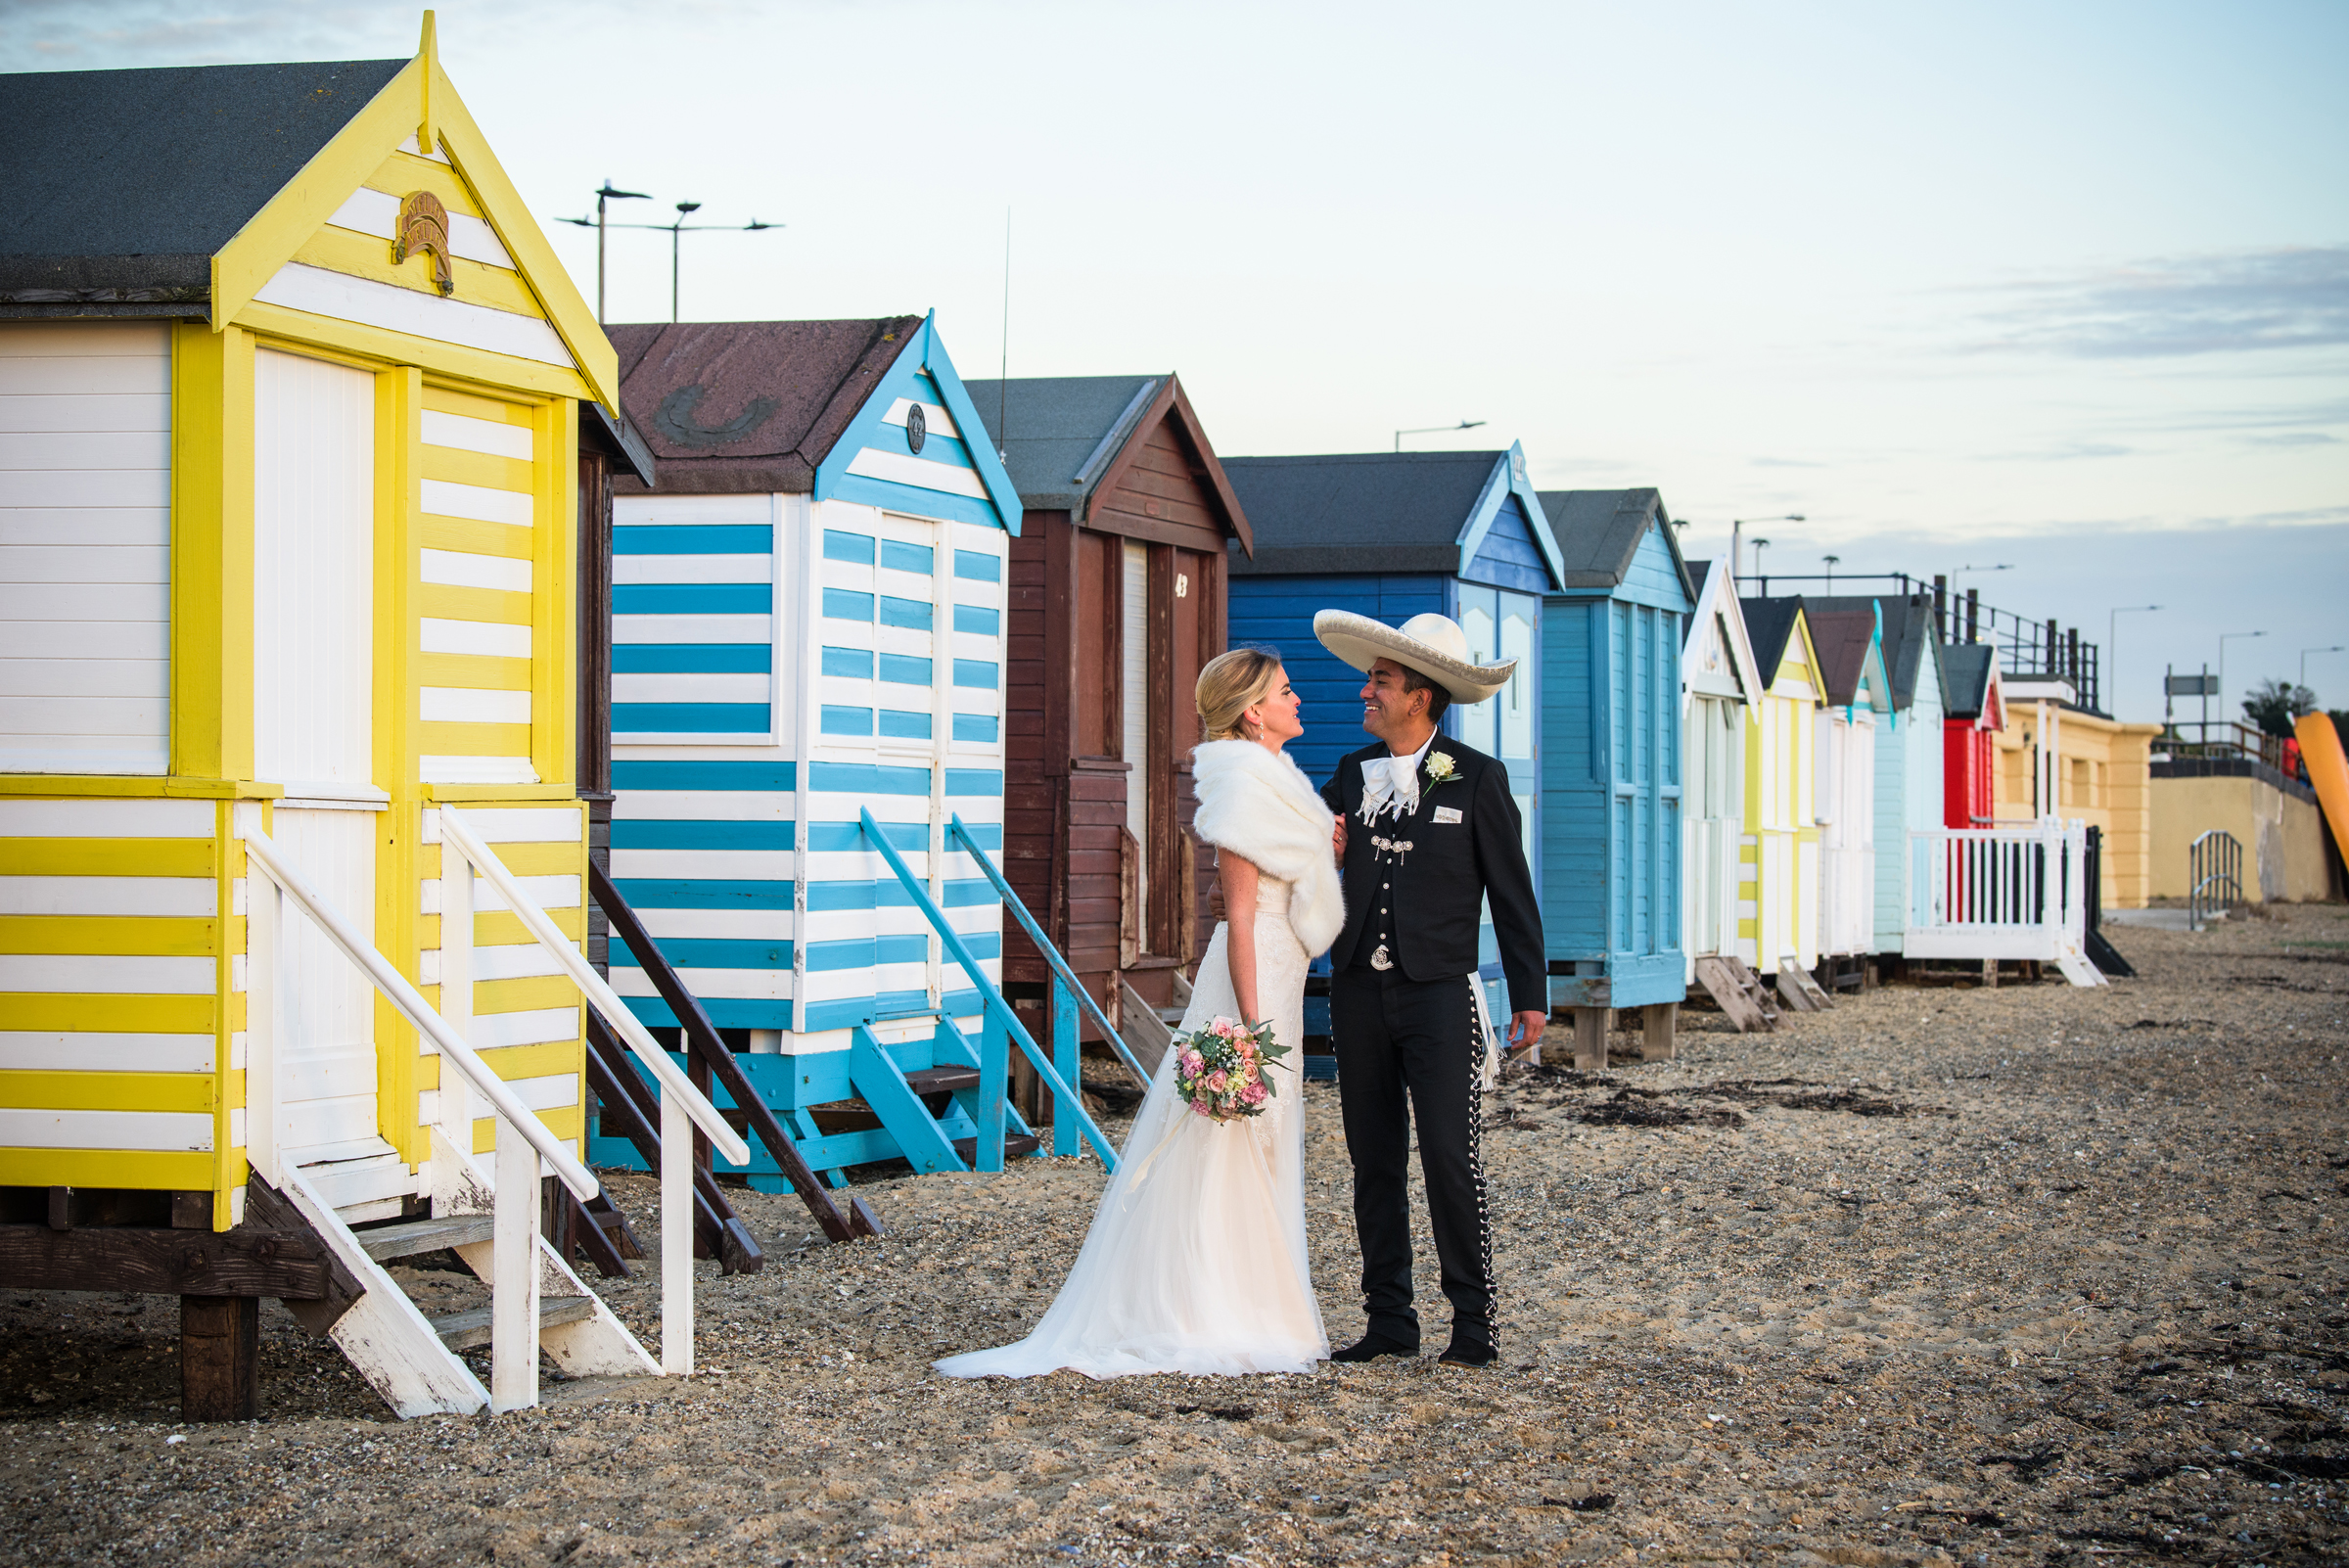 Weddings at The Roslin Beach Hotel